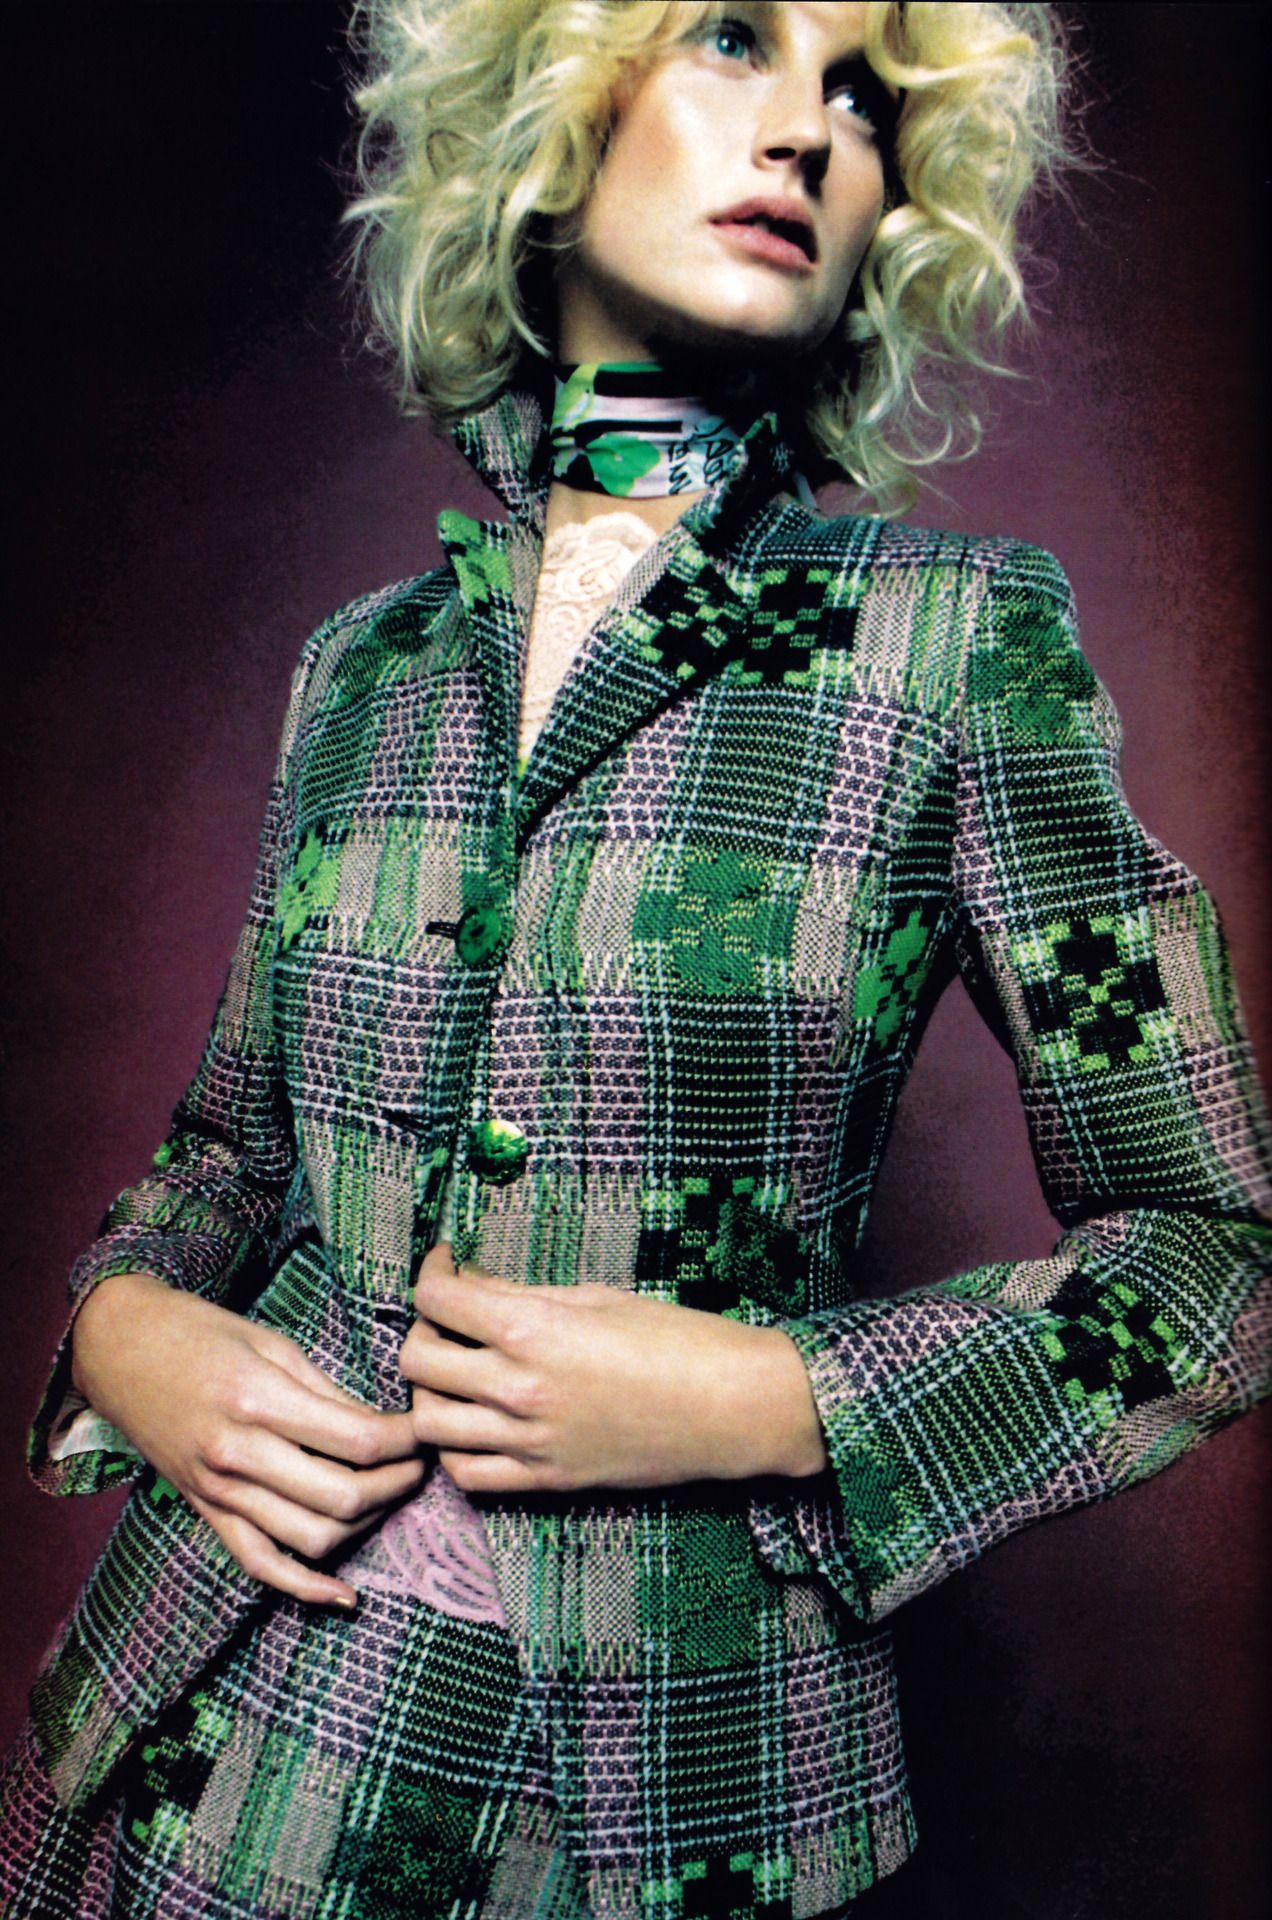 Christian Lacroix, American Vogue, March 1997. Photograph by Francesca Sorrenti.